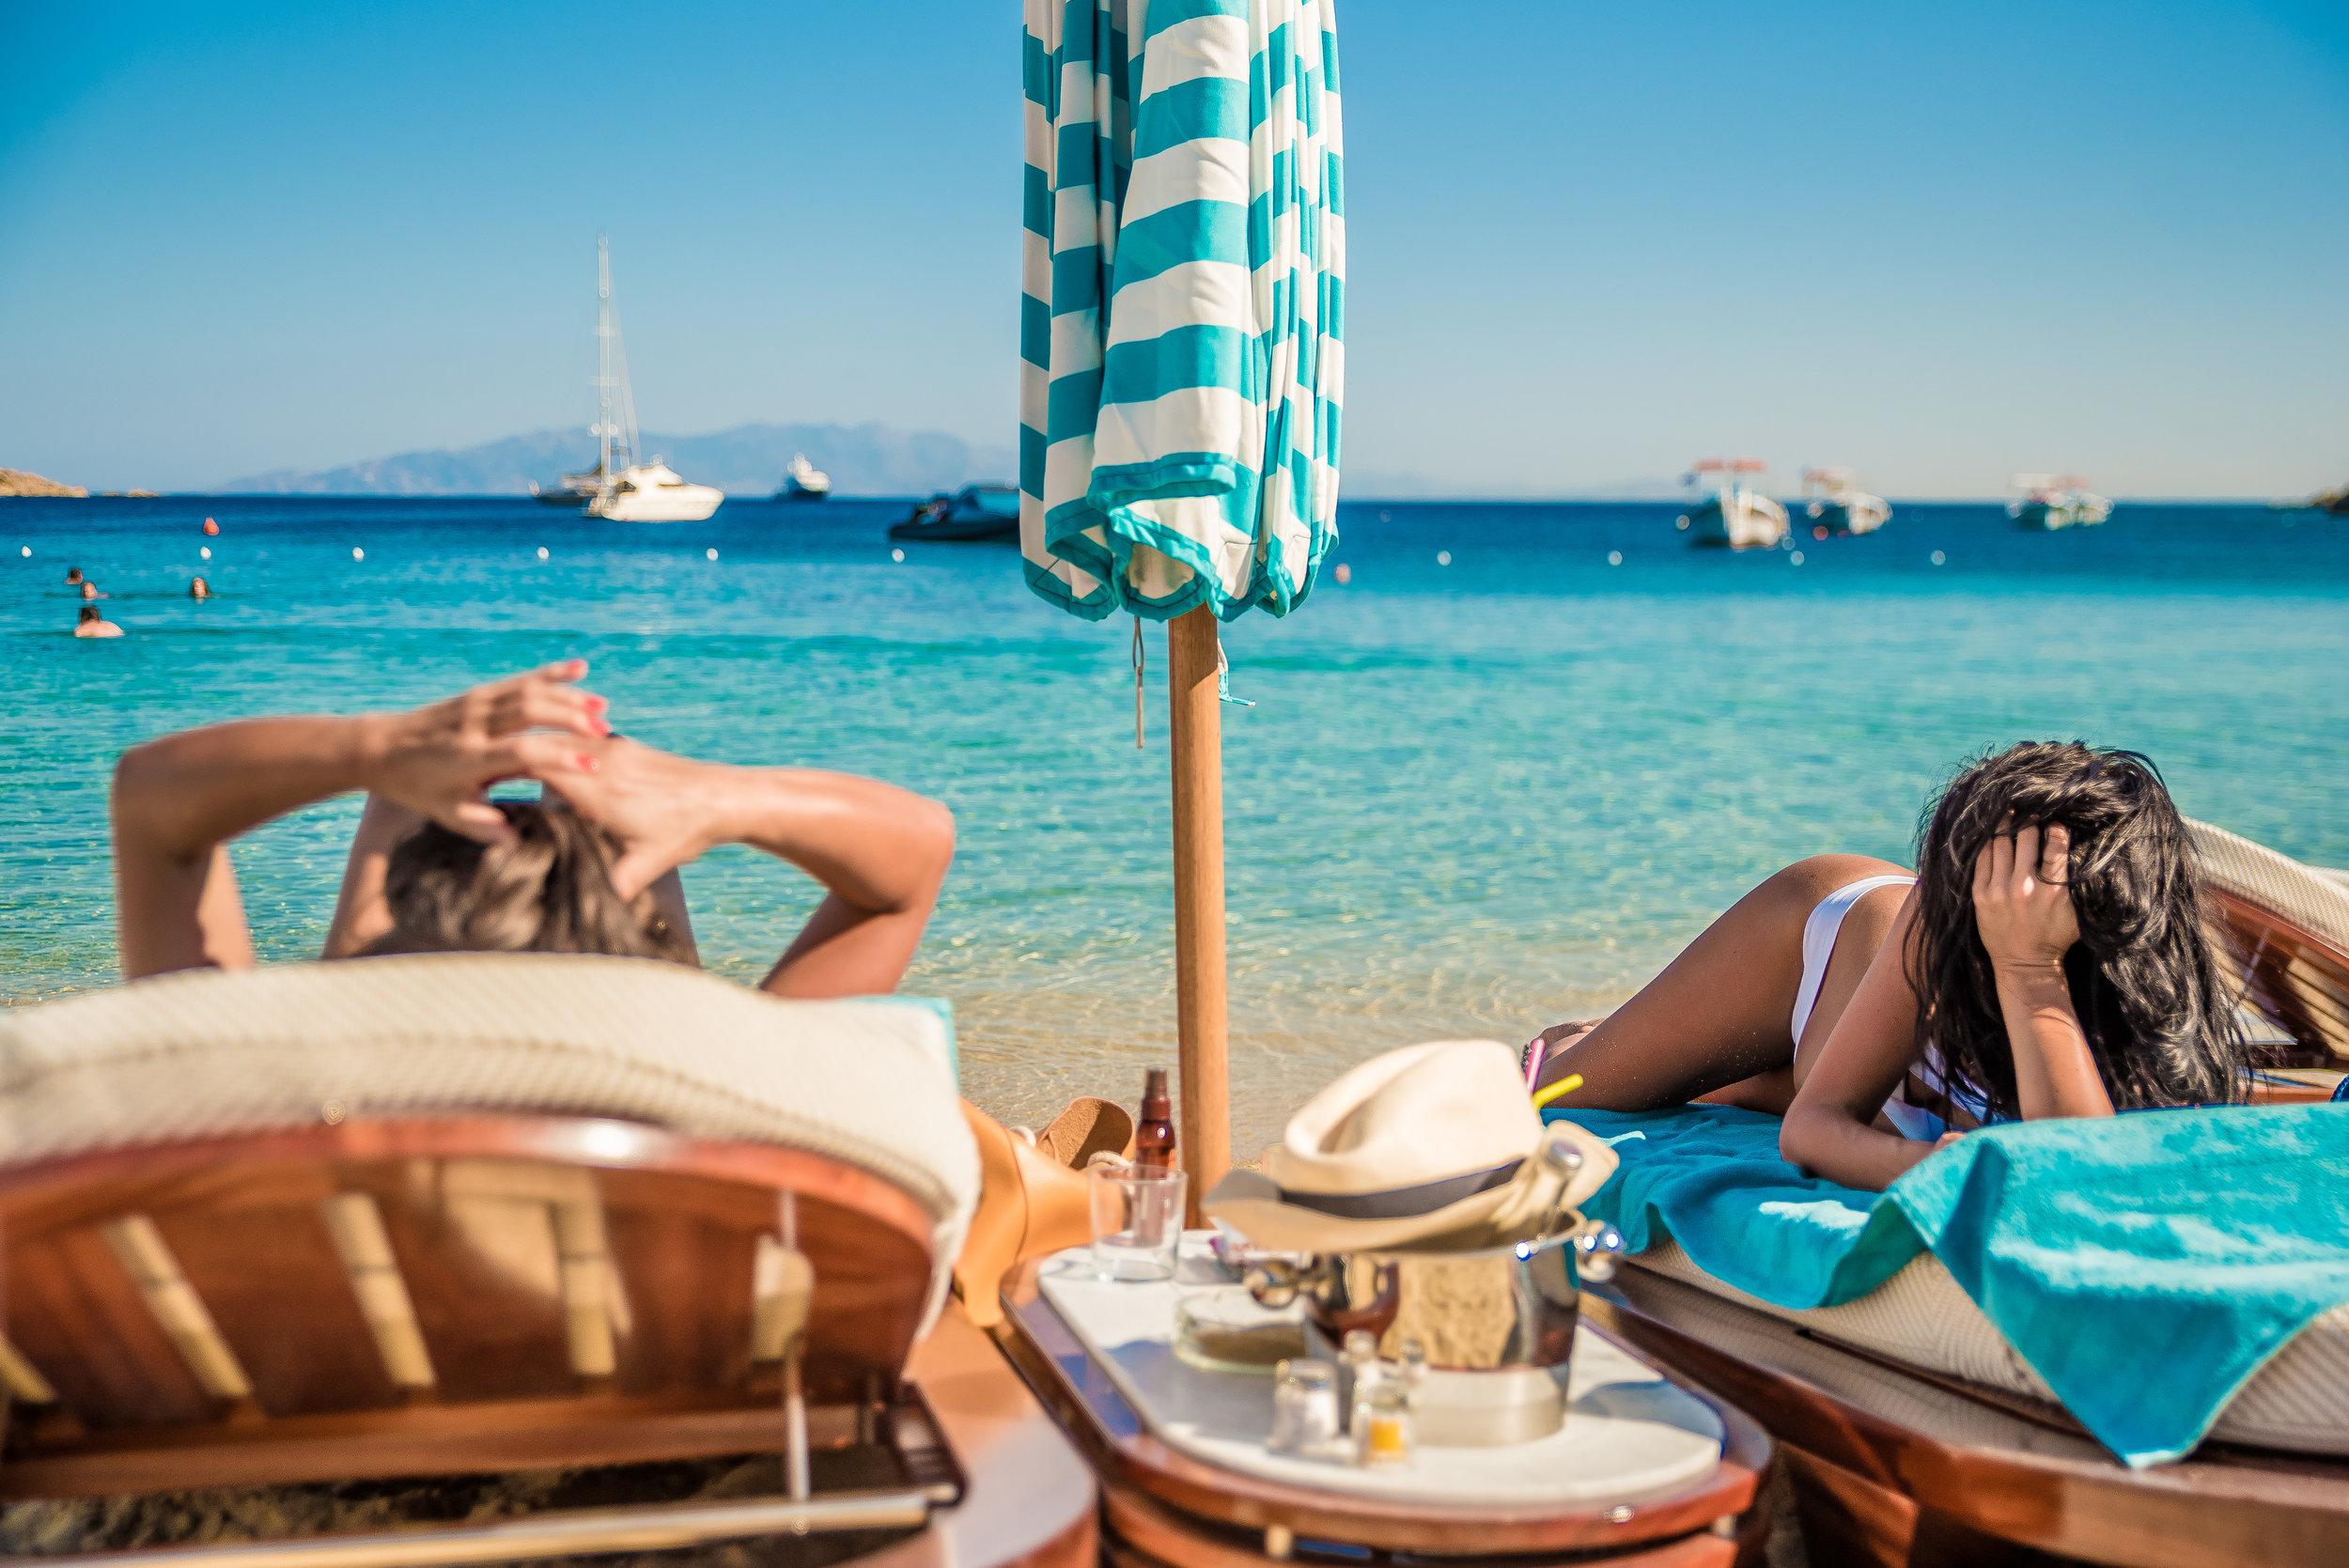 Seora Features In The Best Beach Club In The World Nammos Mykonos Beach 7 - Masha Shapiro Agency UK.jpg